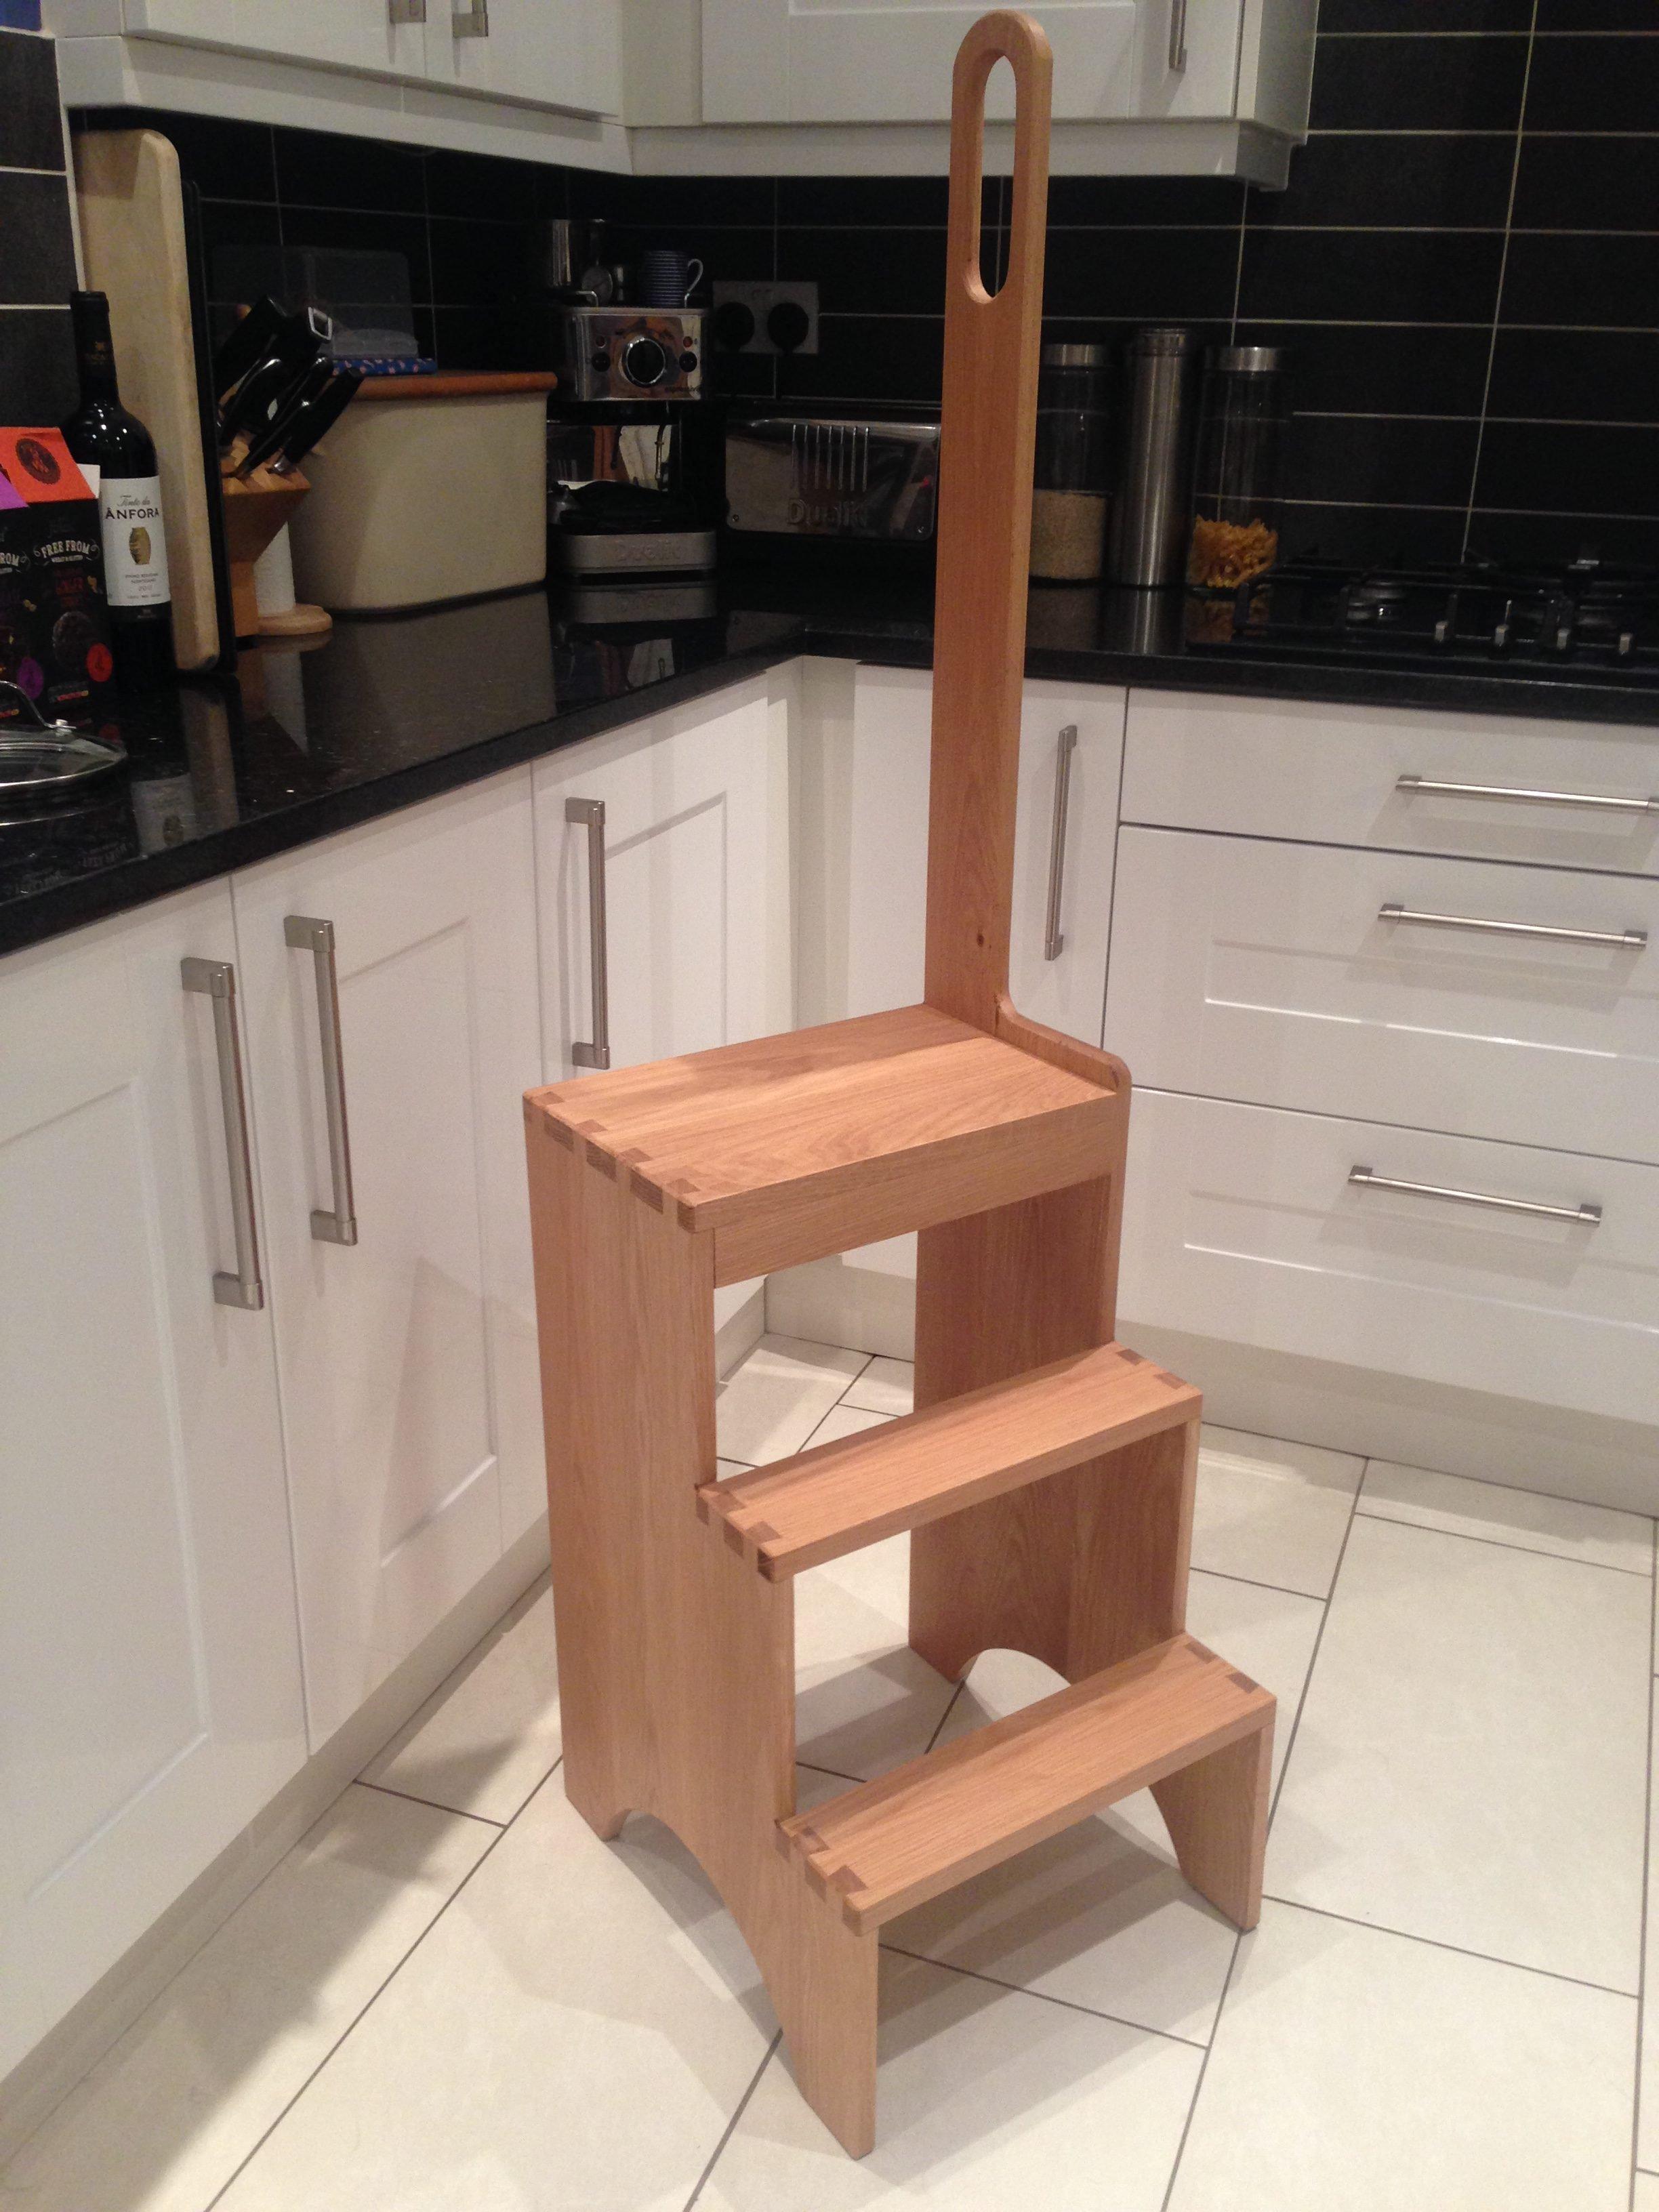 Shacker-style Kitchen Steps by nyda